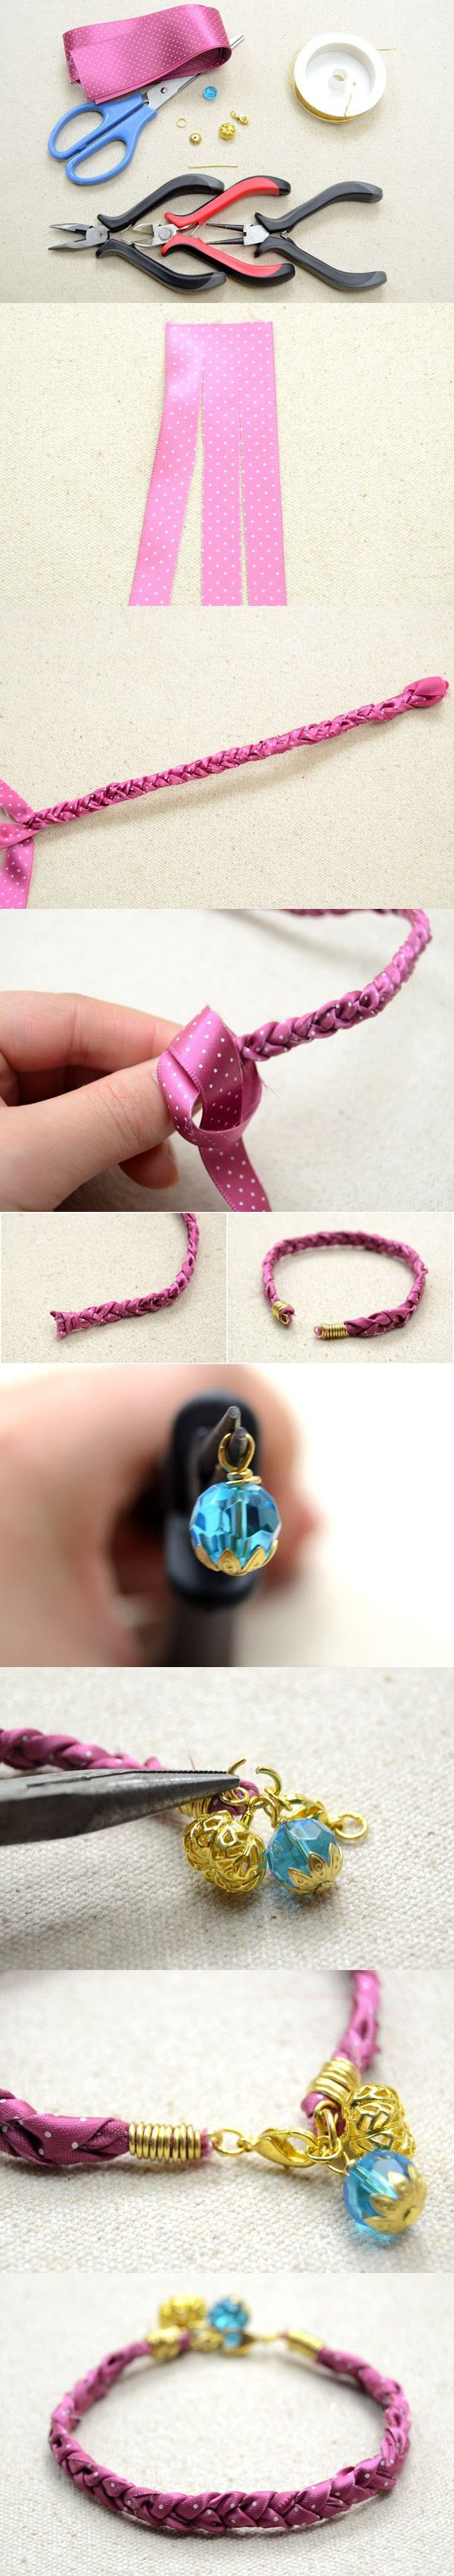 Making Braided Ribbon Bracelet within 2 Minutes